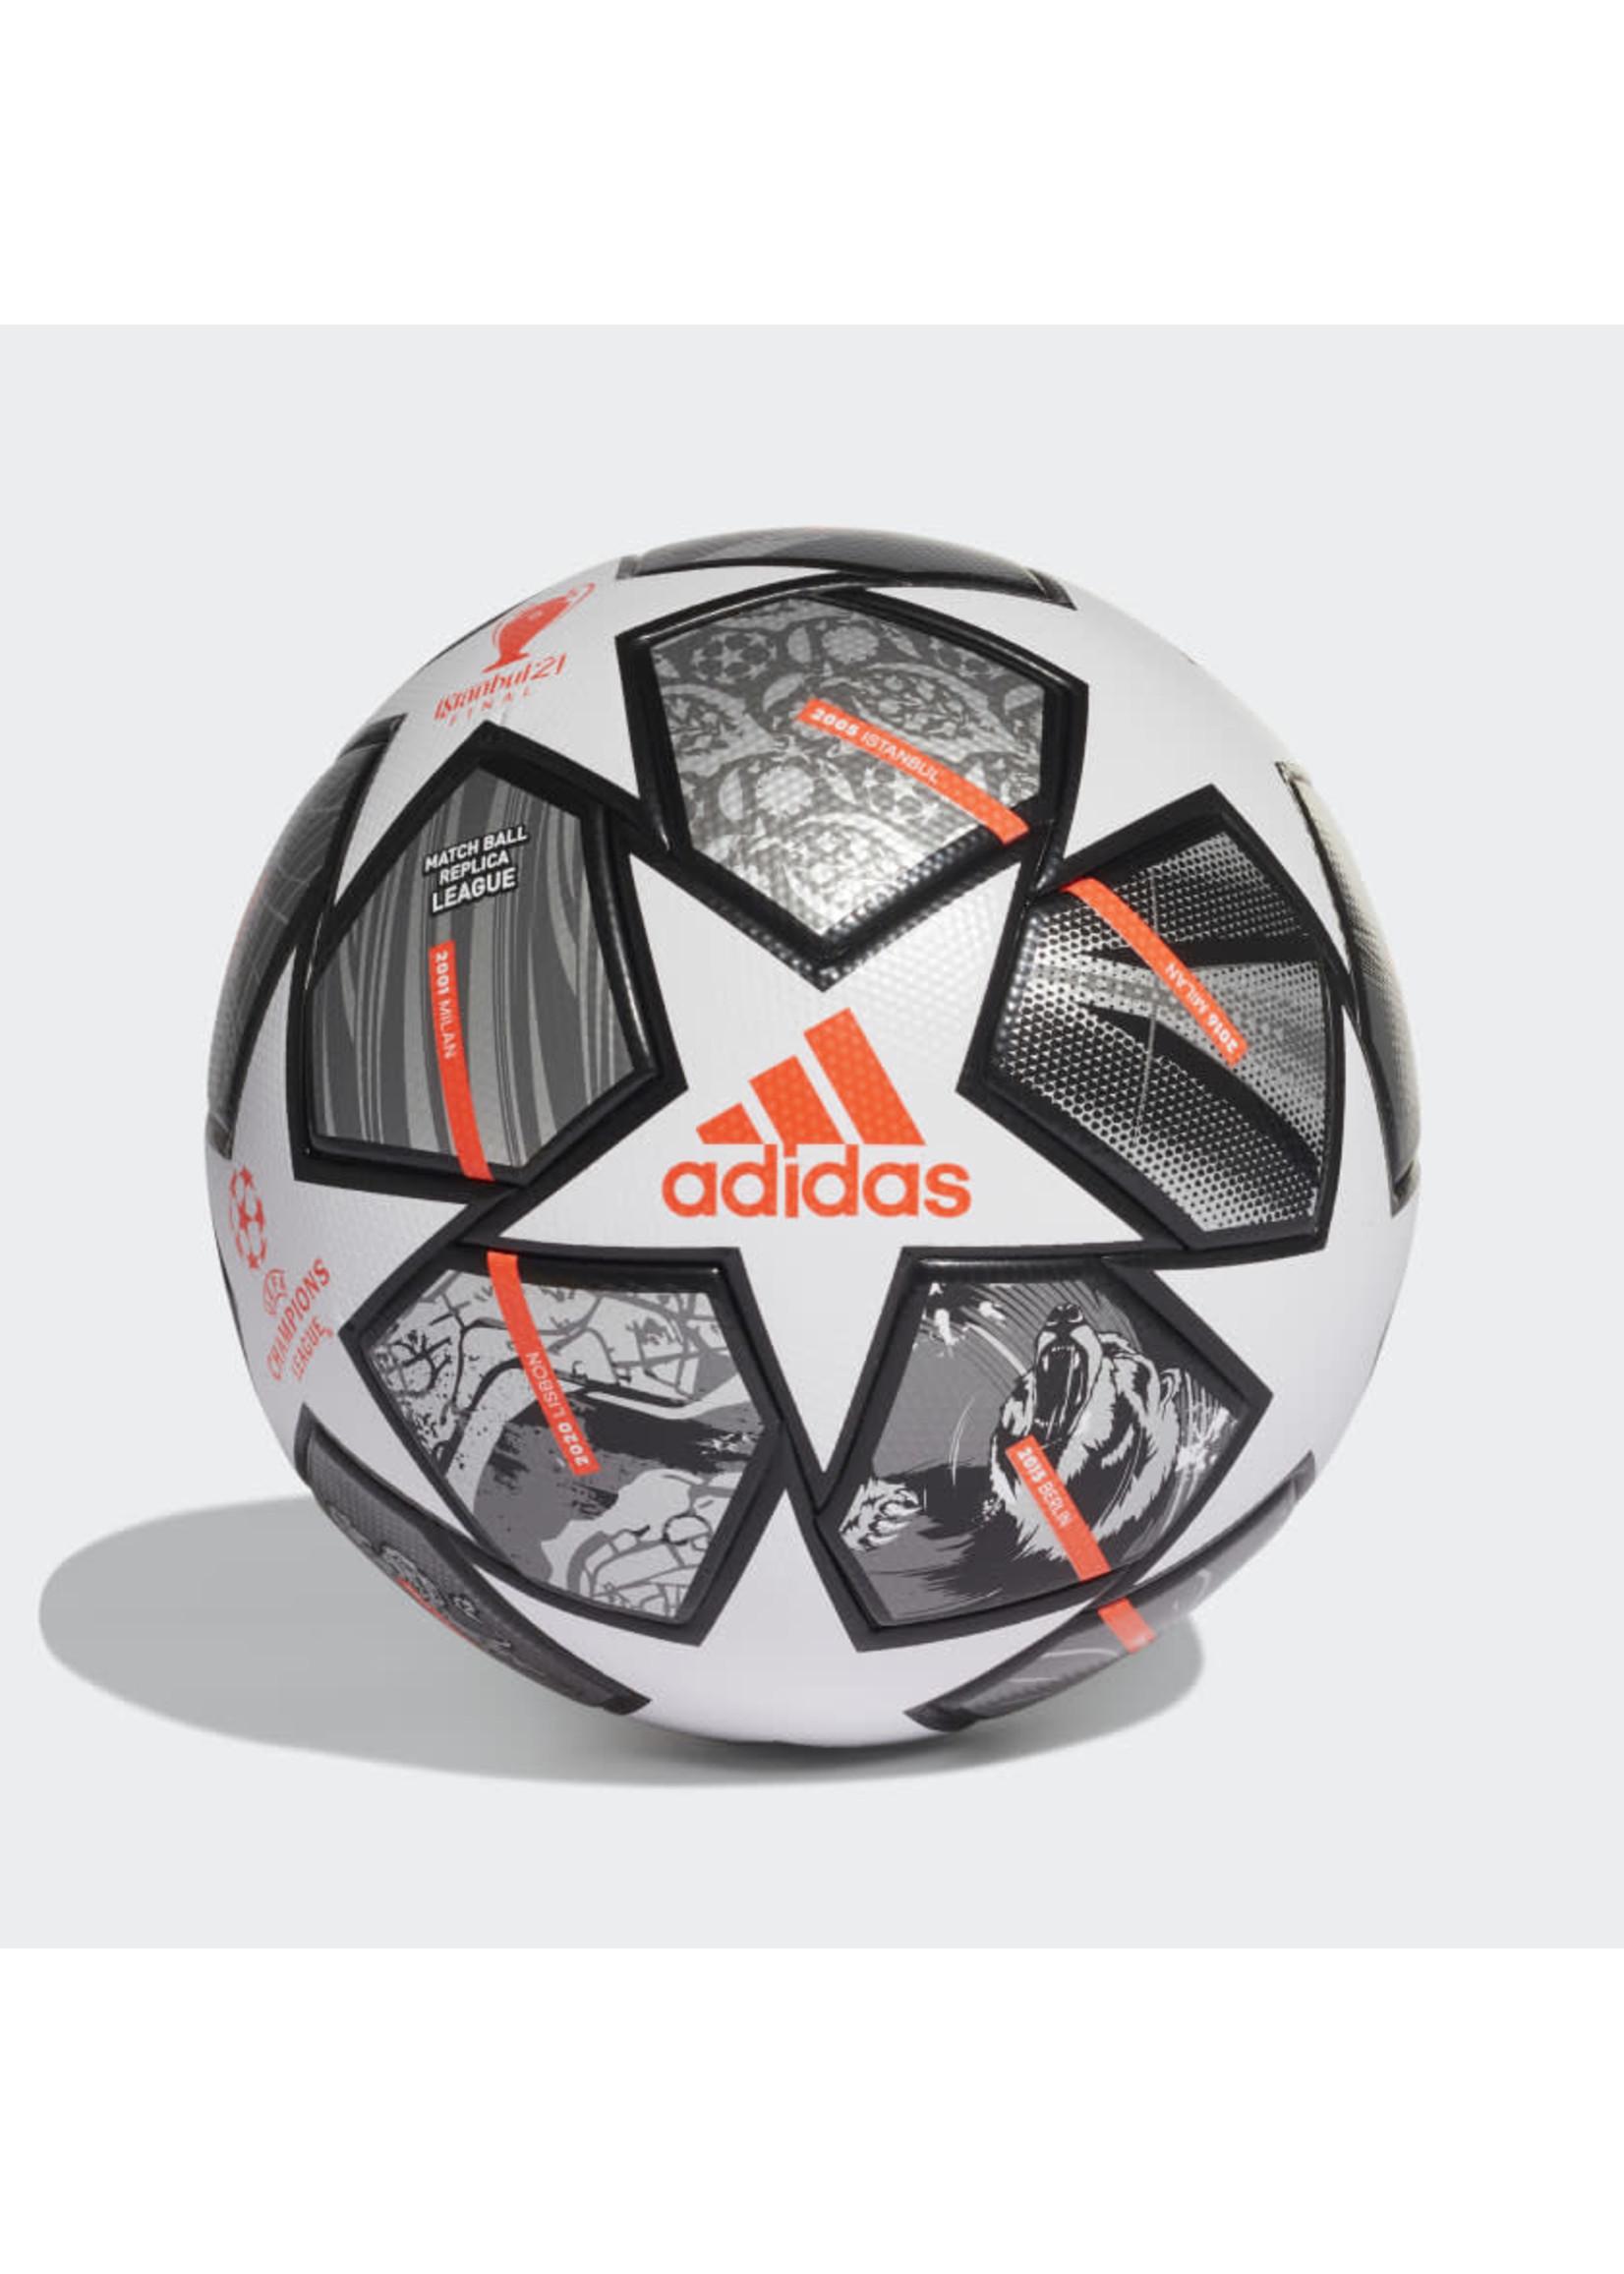 Adidas Champions League Finale League Ball